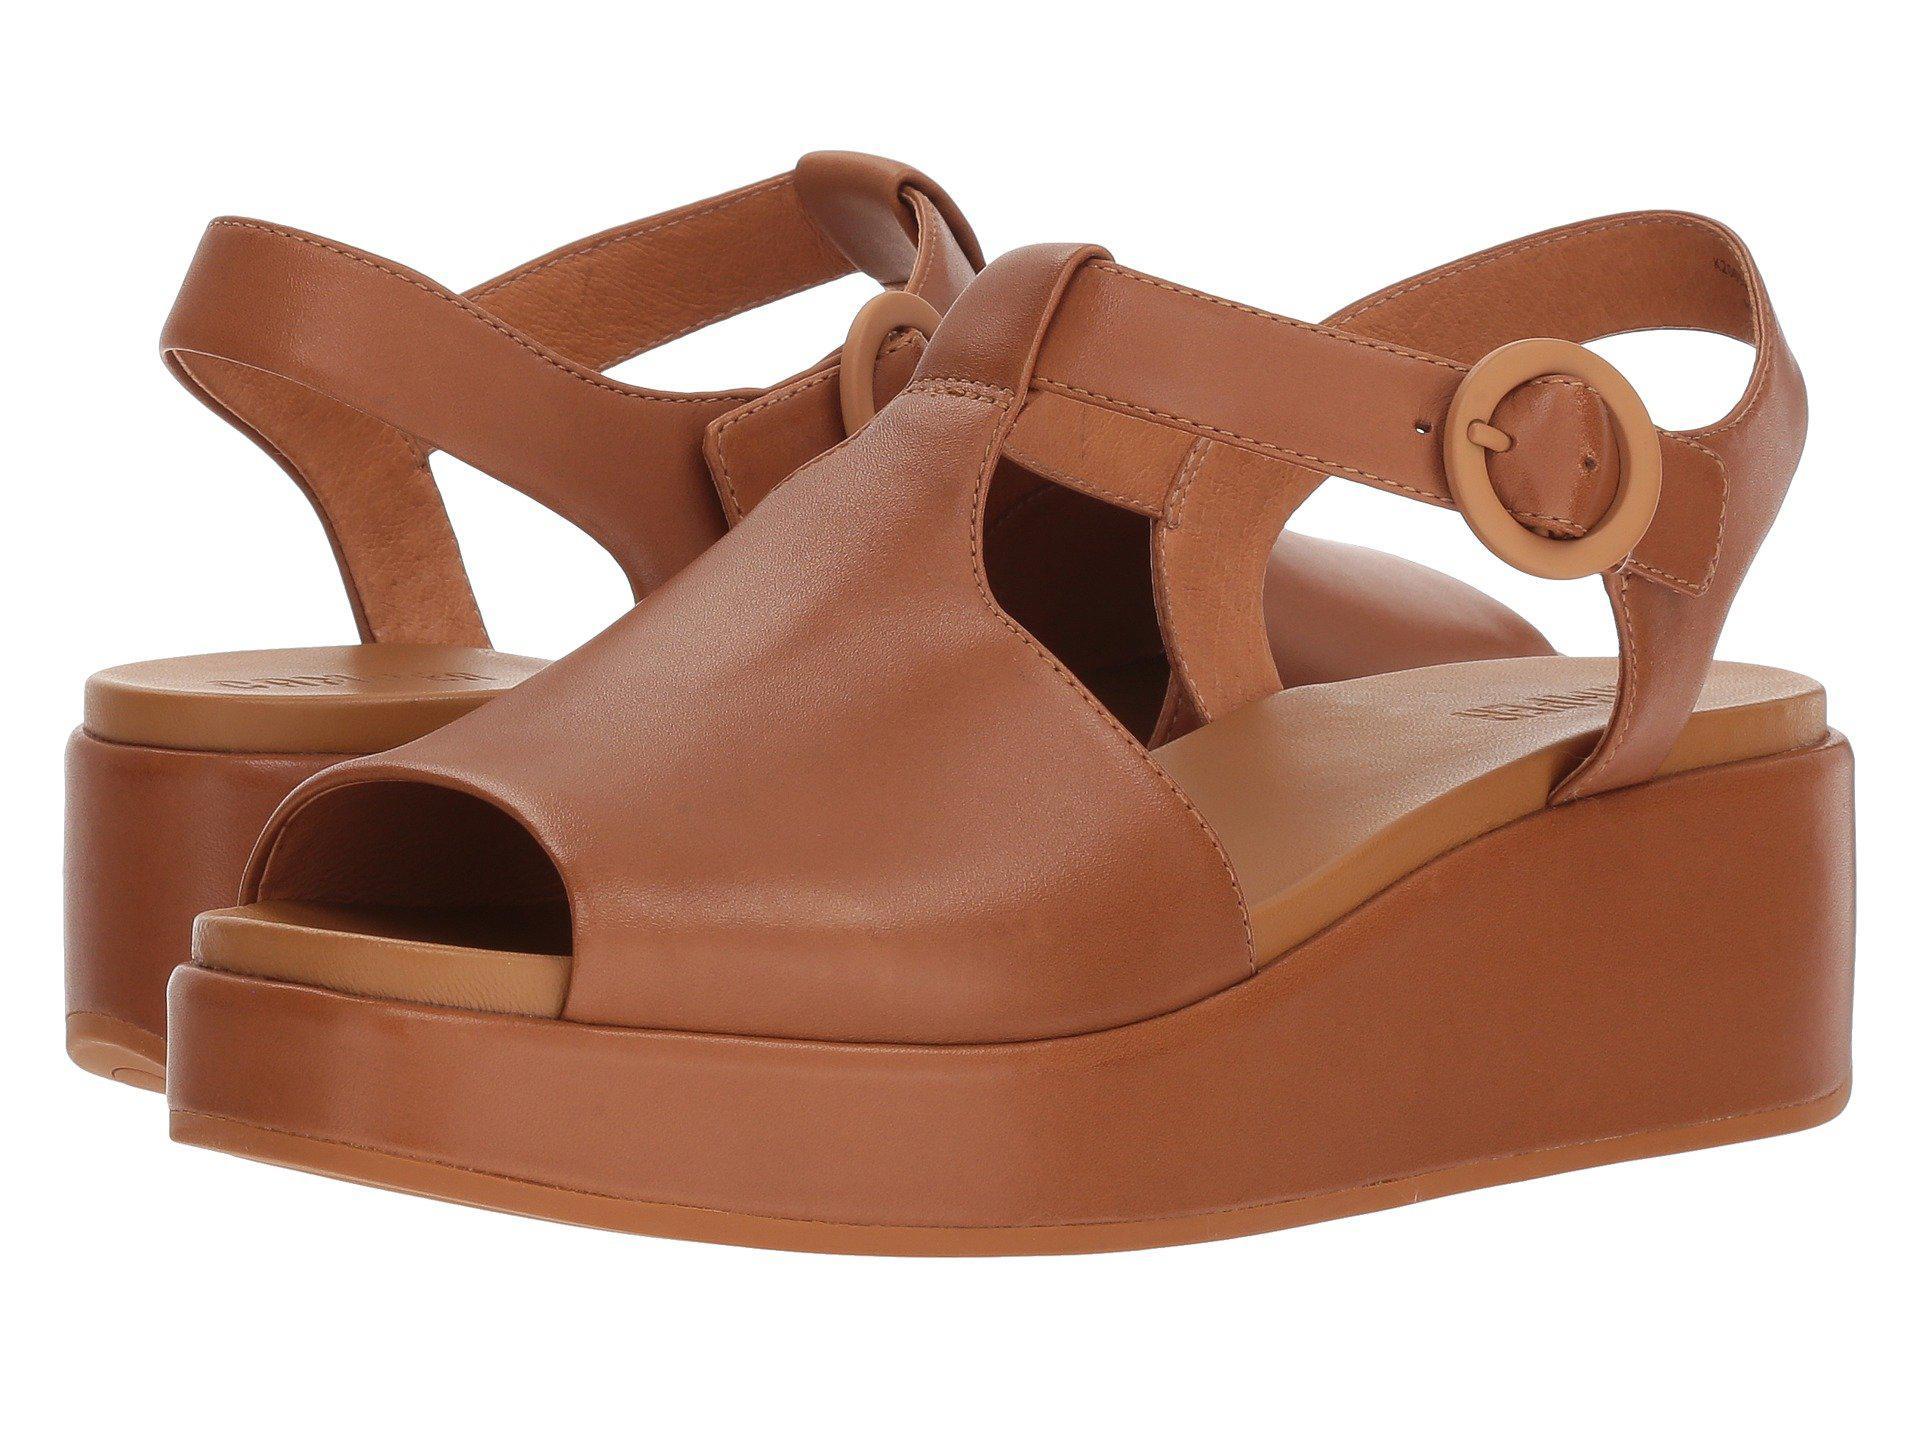 25bae46257b Lyst - Camper Misia - K200568 (rust coppe) Women s Shoes in Brown